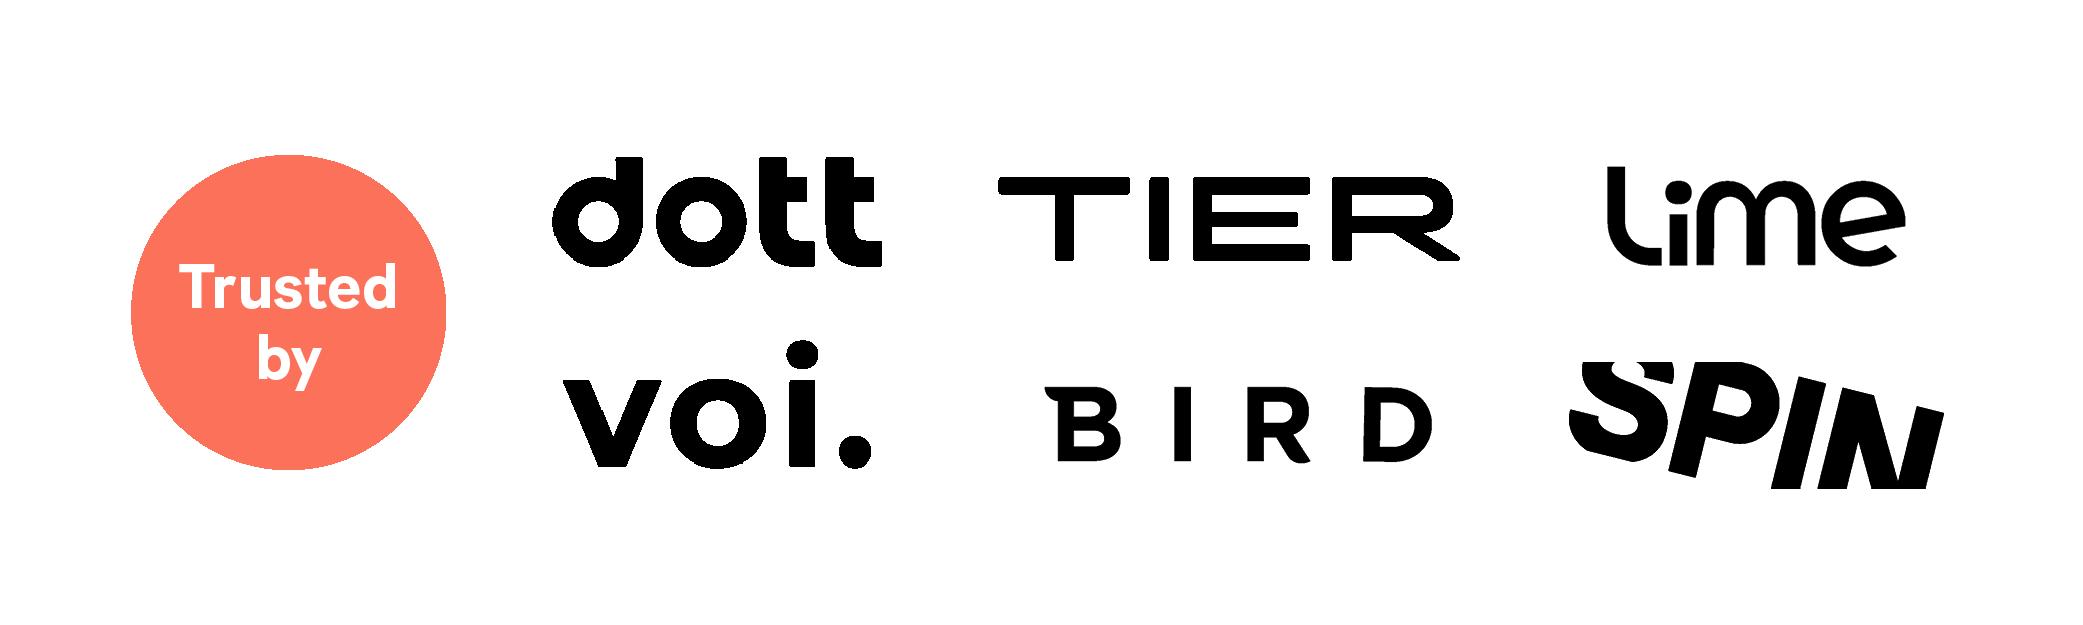 okai-trusted-by-logos-dott-tier-lime-voi-bird-spin